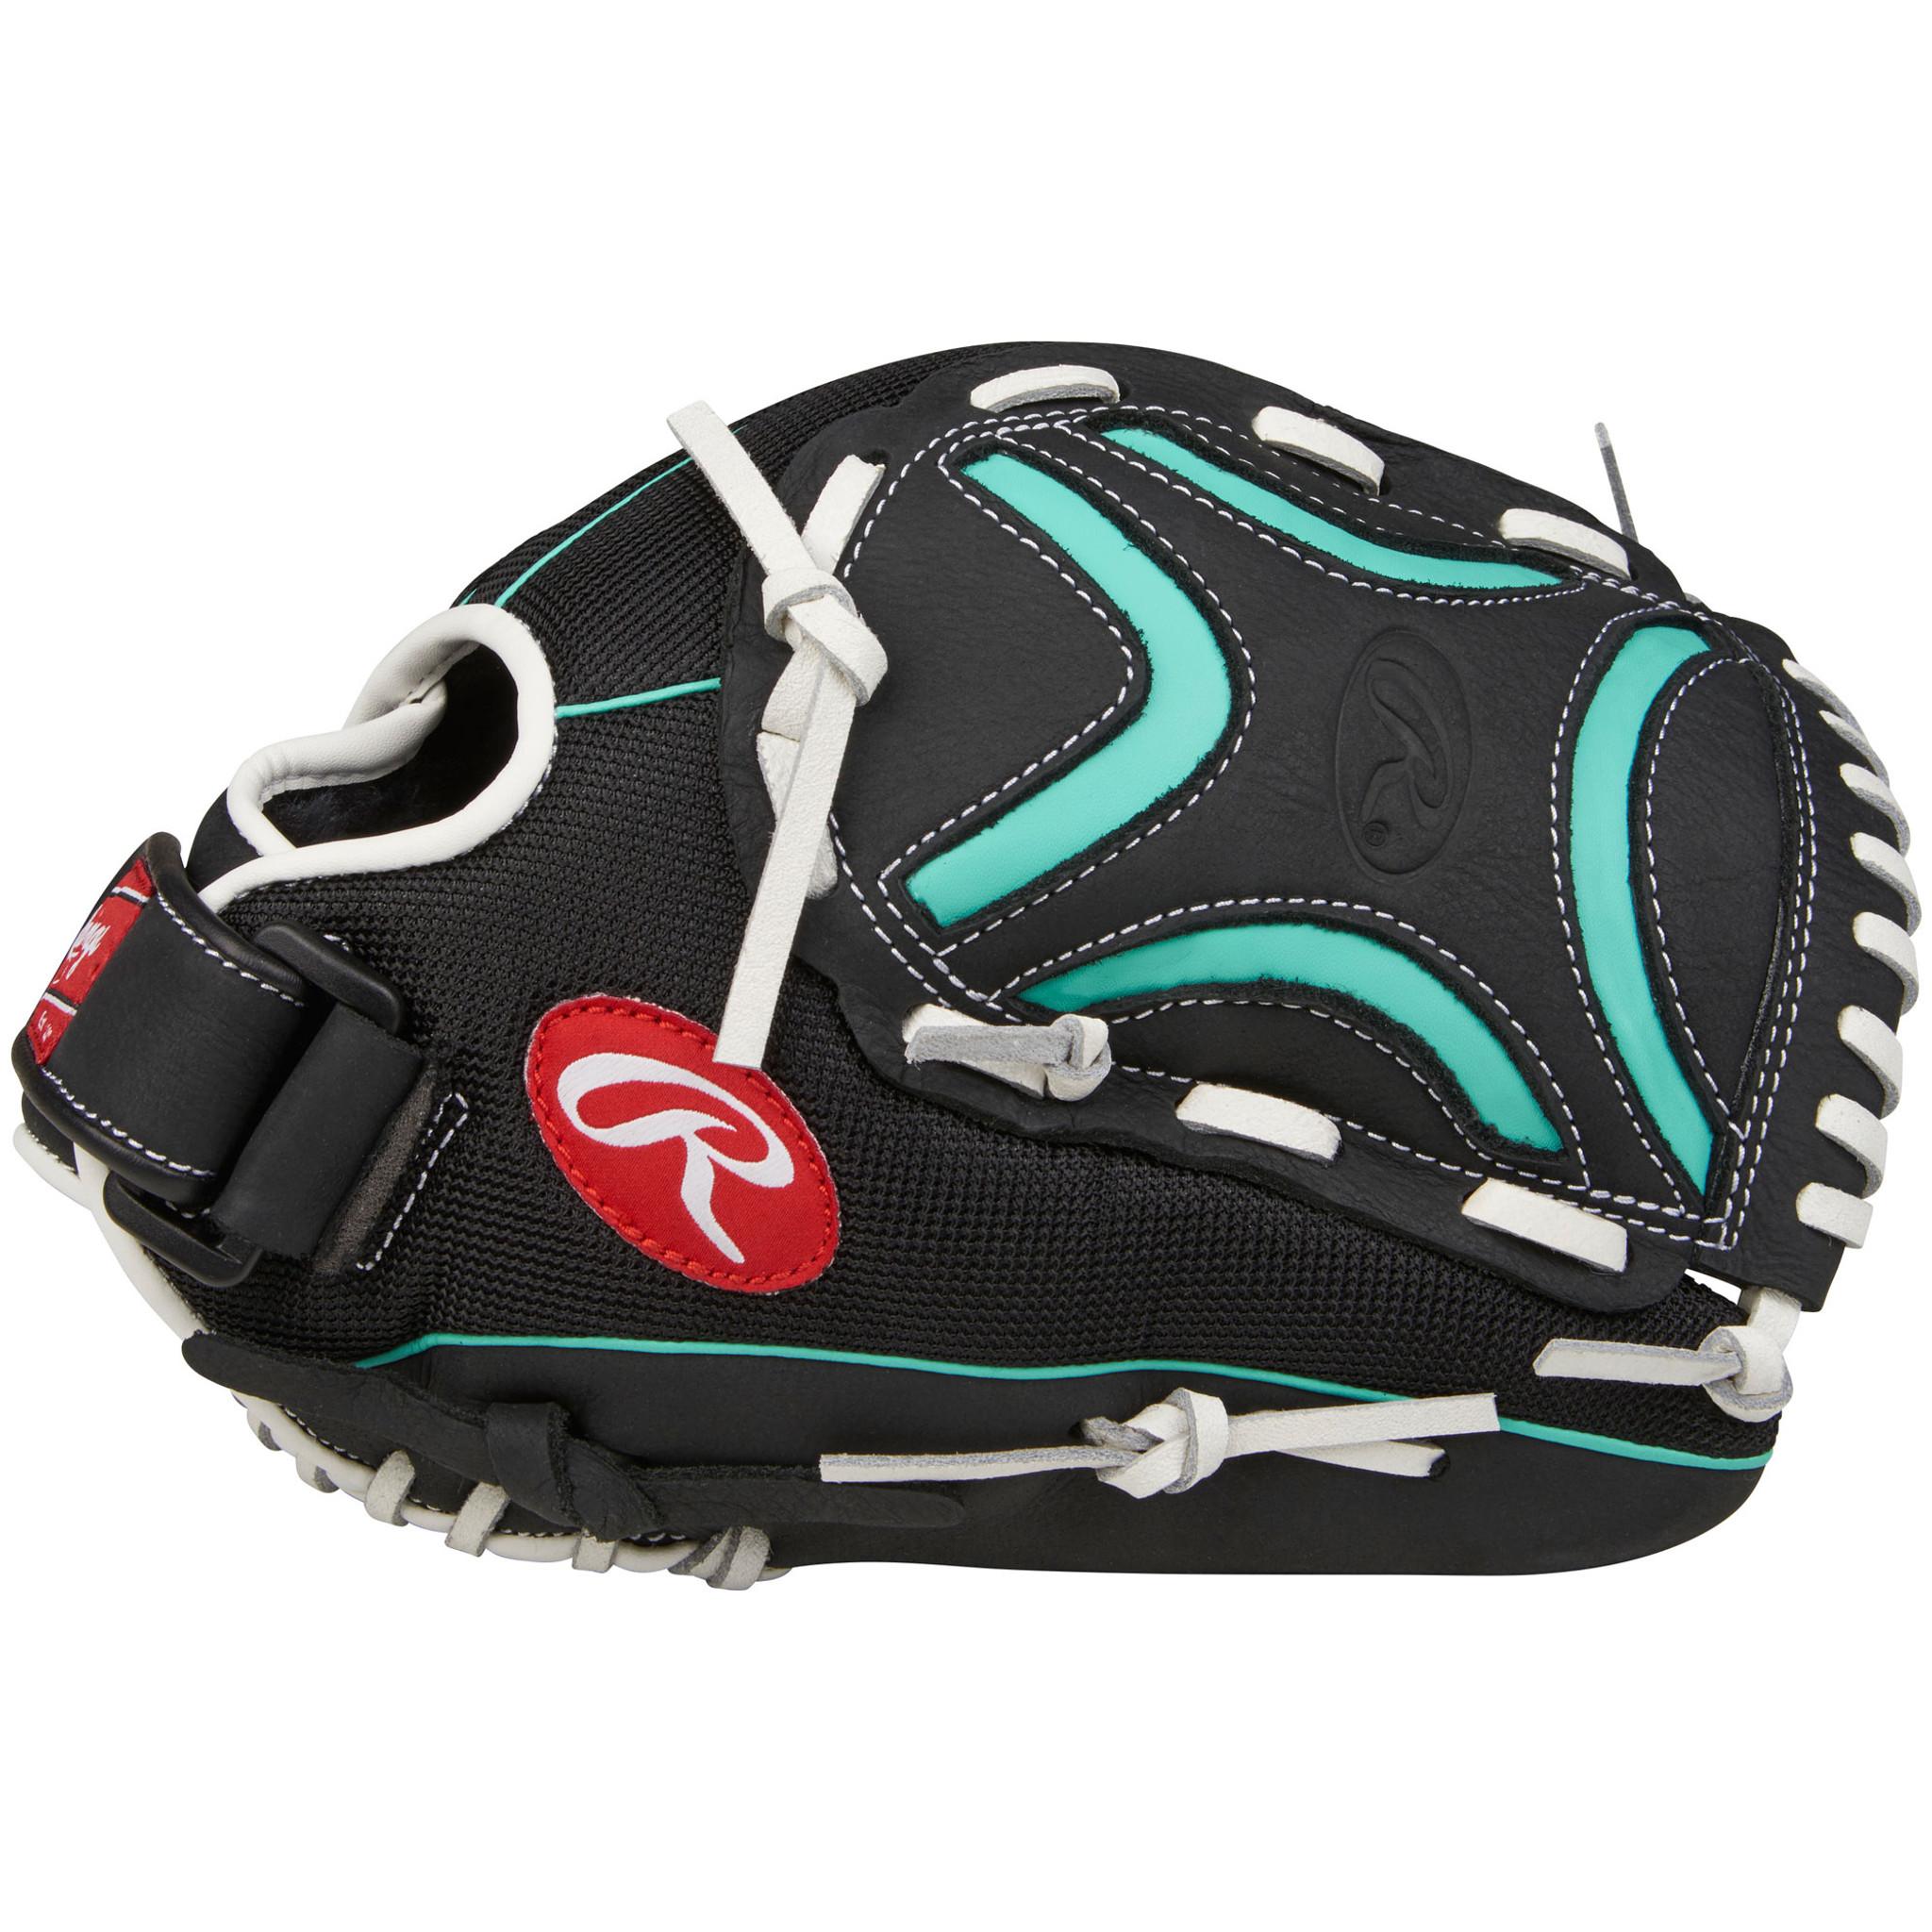 58dfab98e06 ... Rawlings Champion Lite 12 Inch CL120BMT Fastpitch Softball Glove ·  https   d3d71ba2asa5oz.cloudfront.net 40000432 images rawlings-